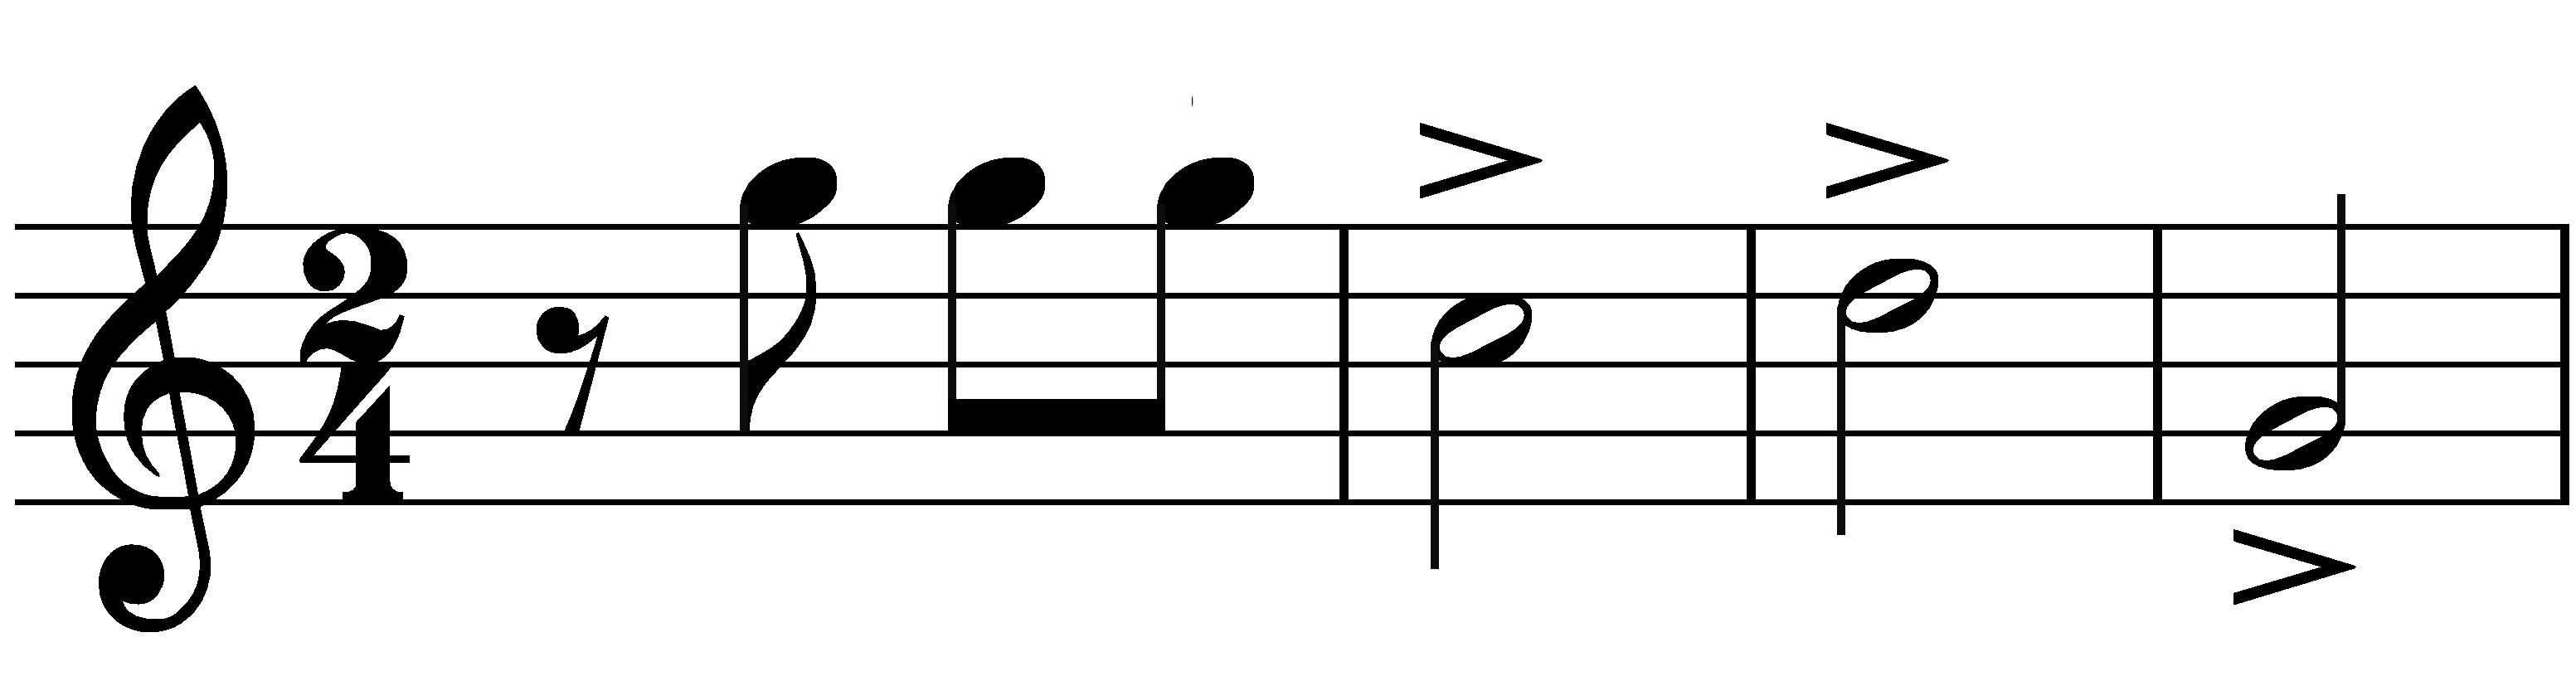 PNG Symphony - 56901